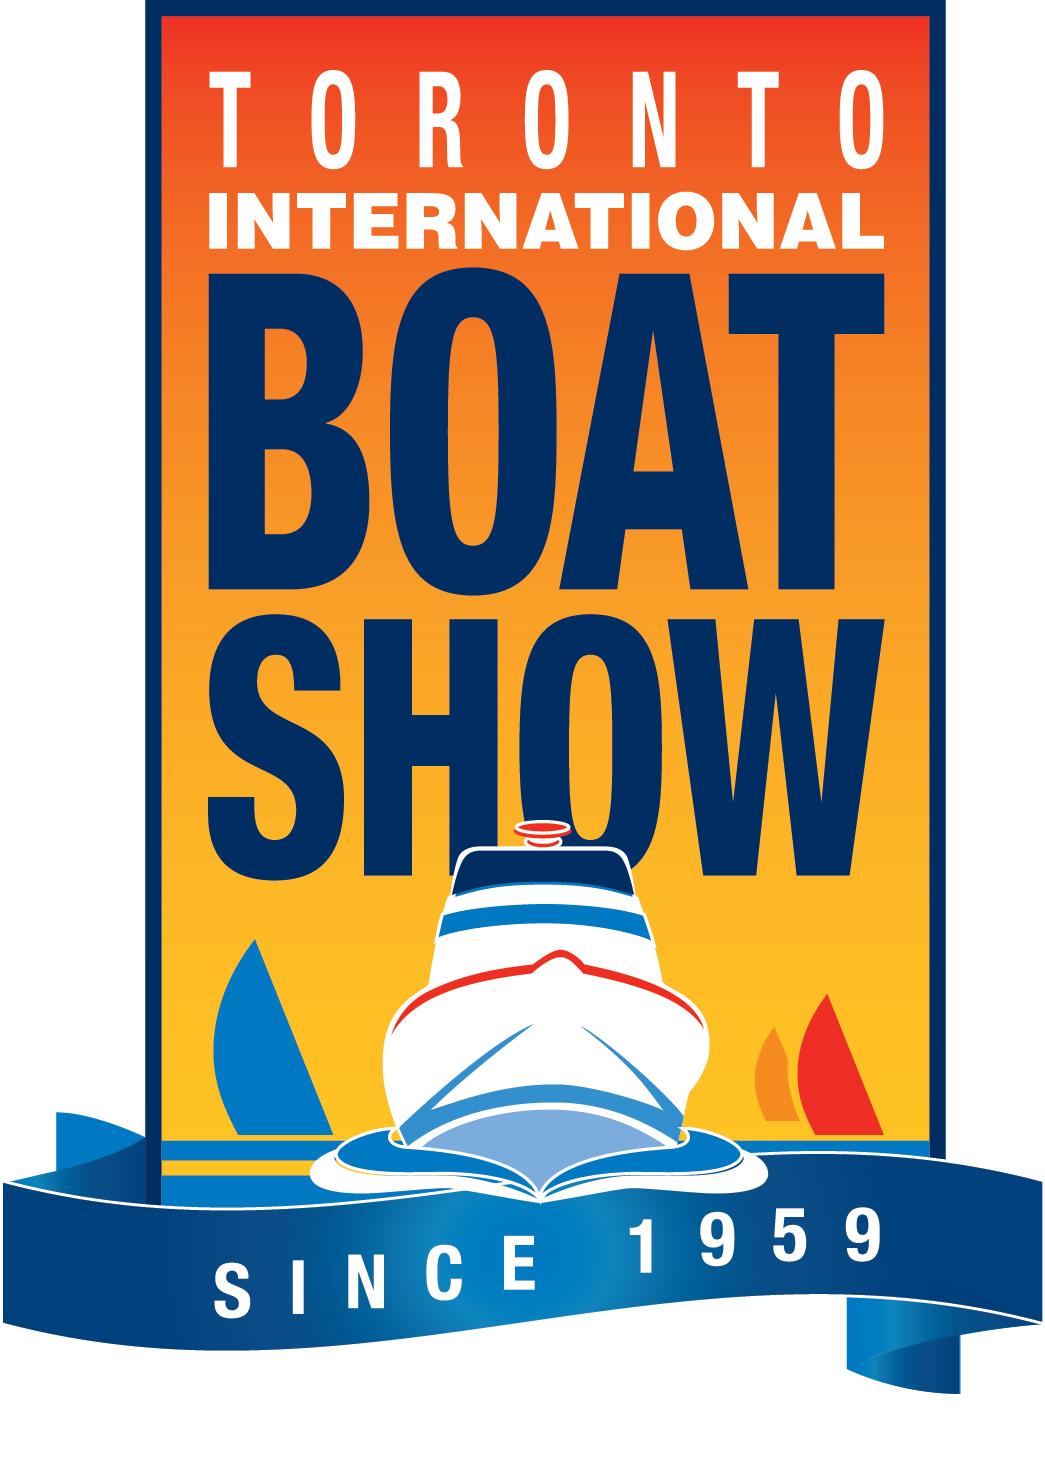 Toronto International Boat Show - image